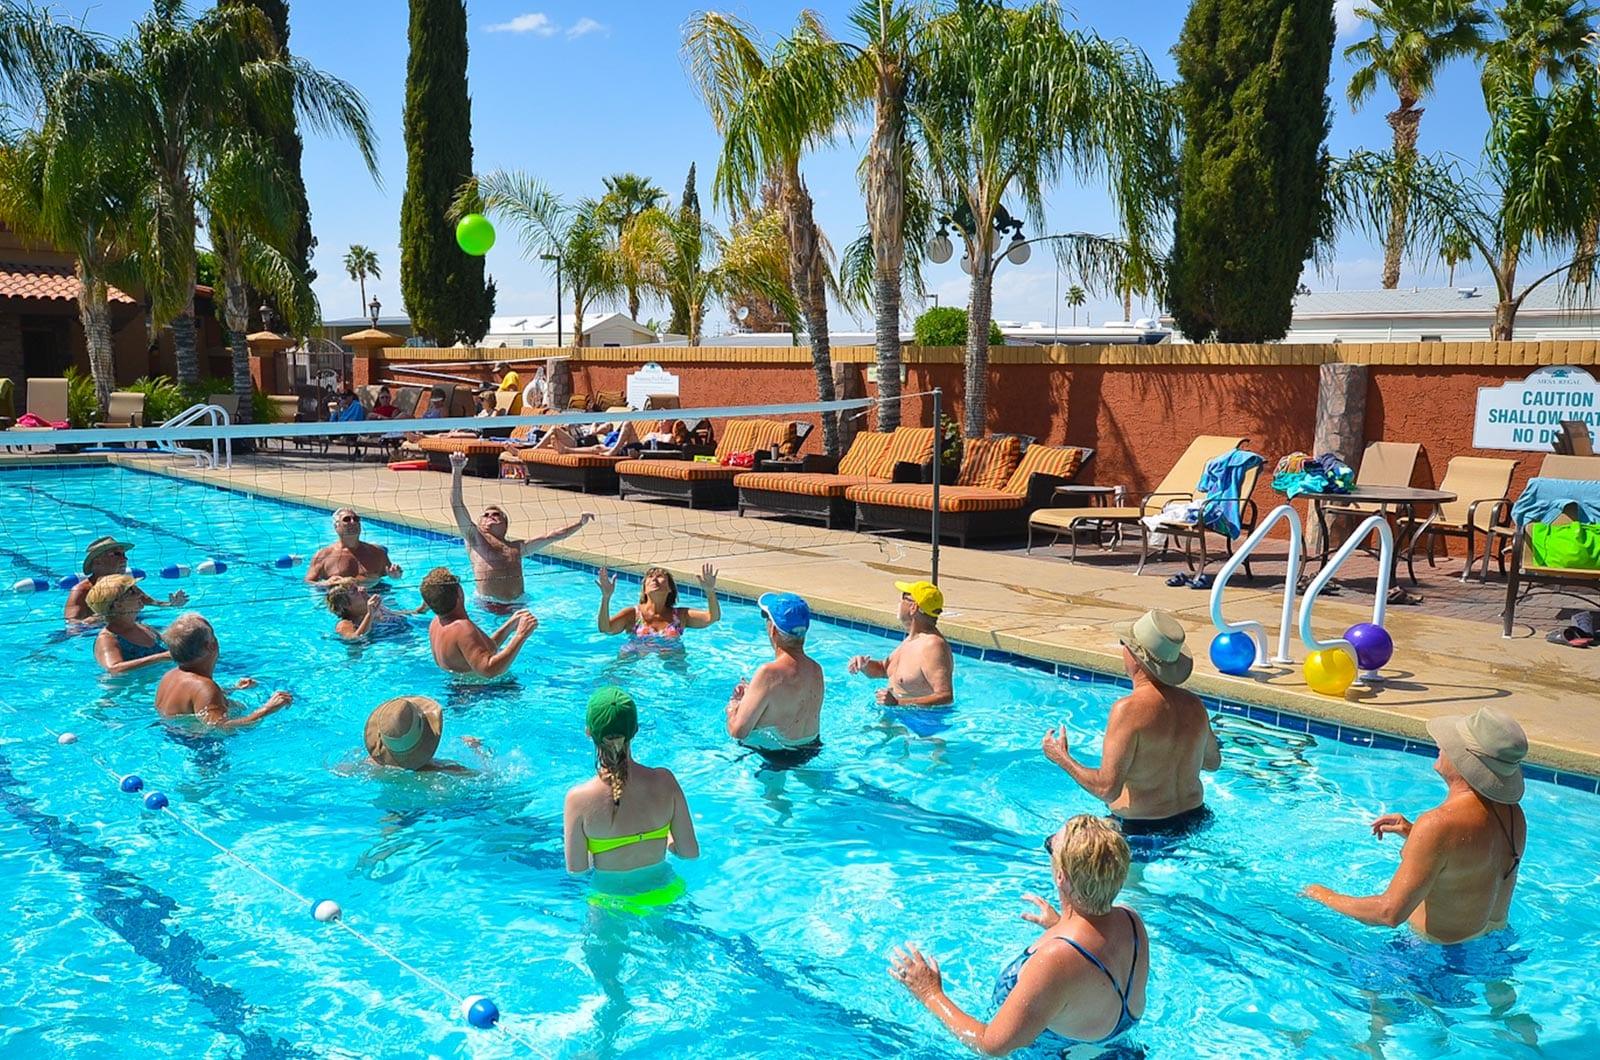 Senior Living Virtual Tour Services   Aerial Photography Services